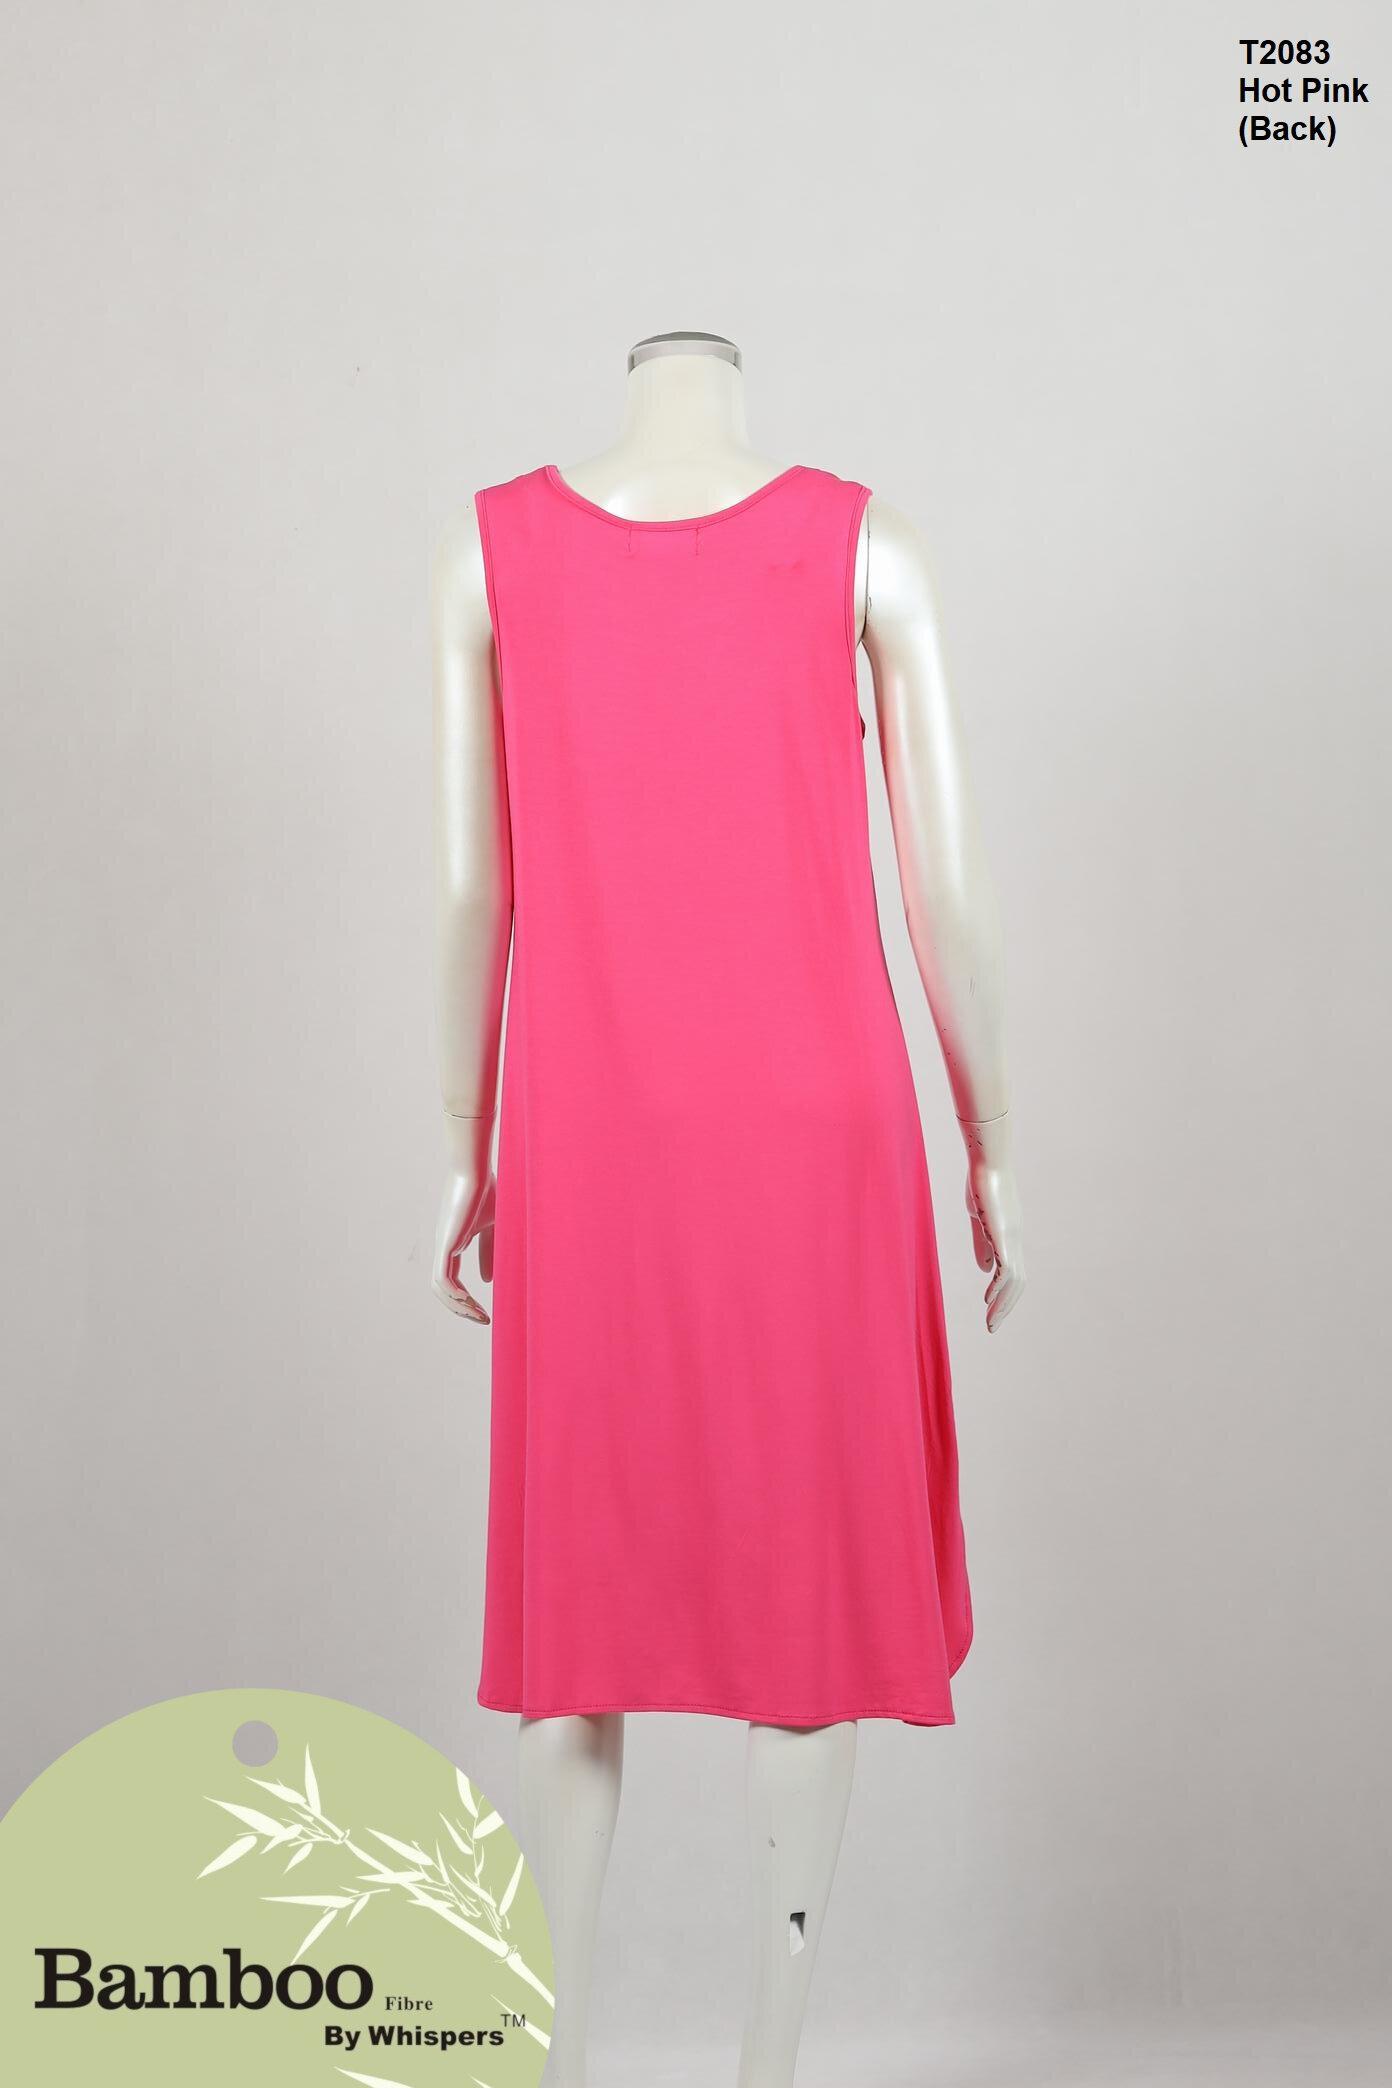 T2083-Bamboo Dress-Hot Pink-Back.JPG